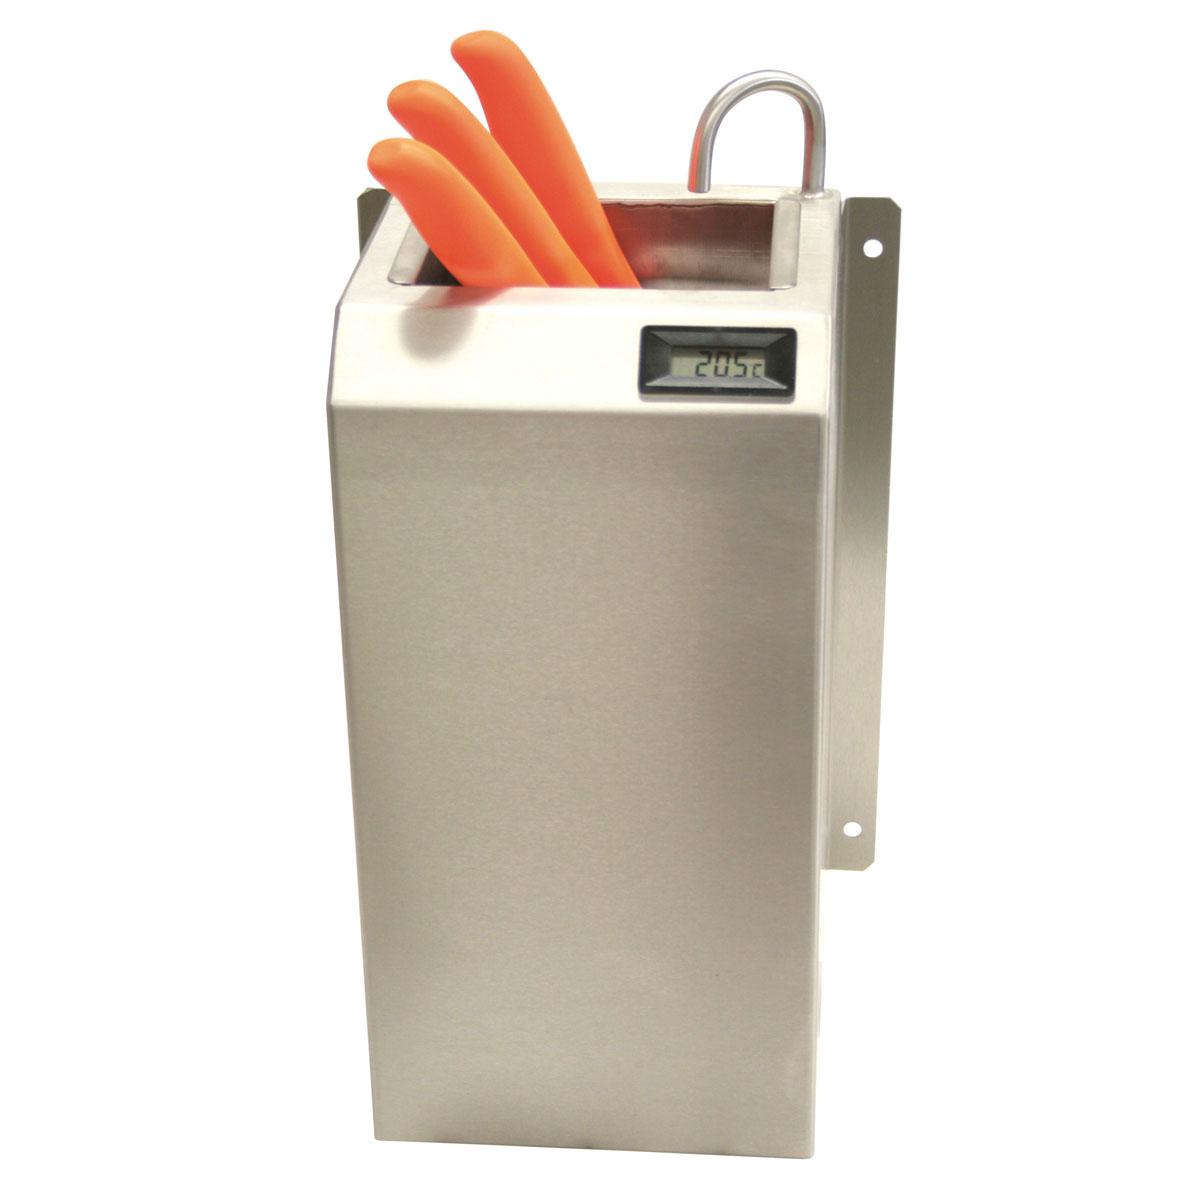 Messer-Desinfektionsbecken mit digitaler Temperaturanzeige, ArtNr.: MB-TA